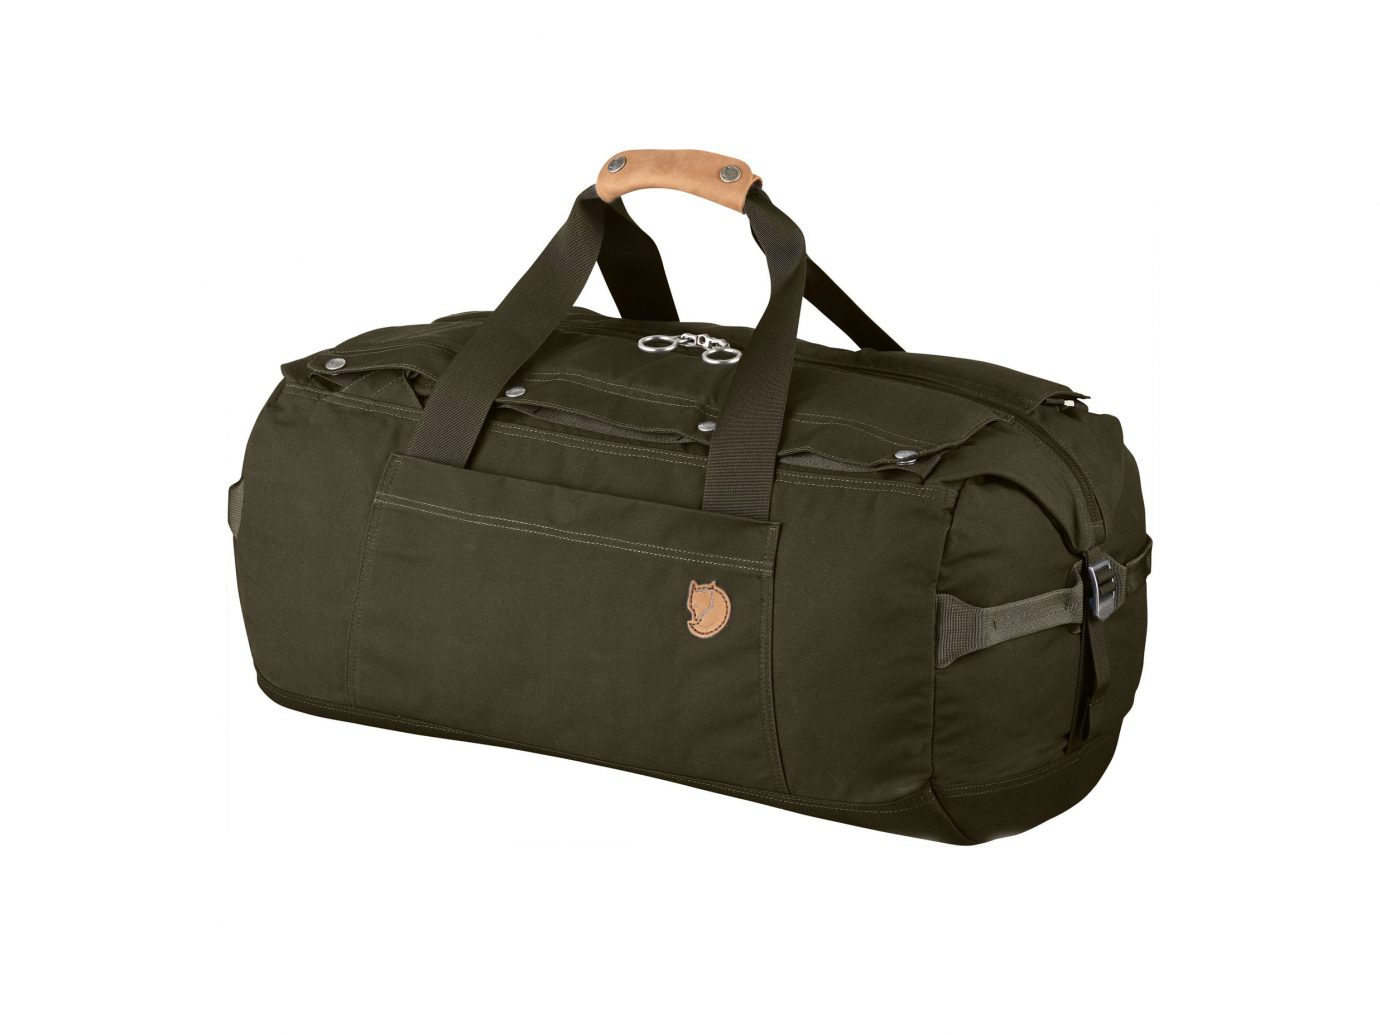 FJÄLLRÄVEN No. 6 Small Convertible Duffle Bag